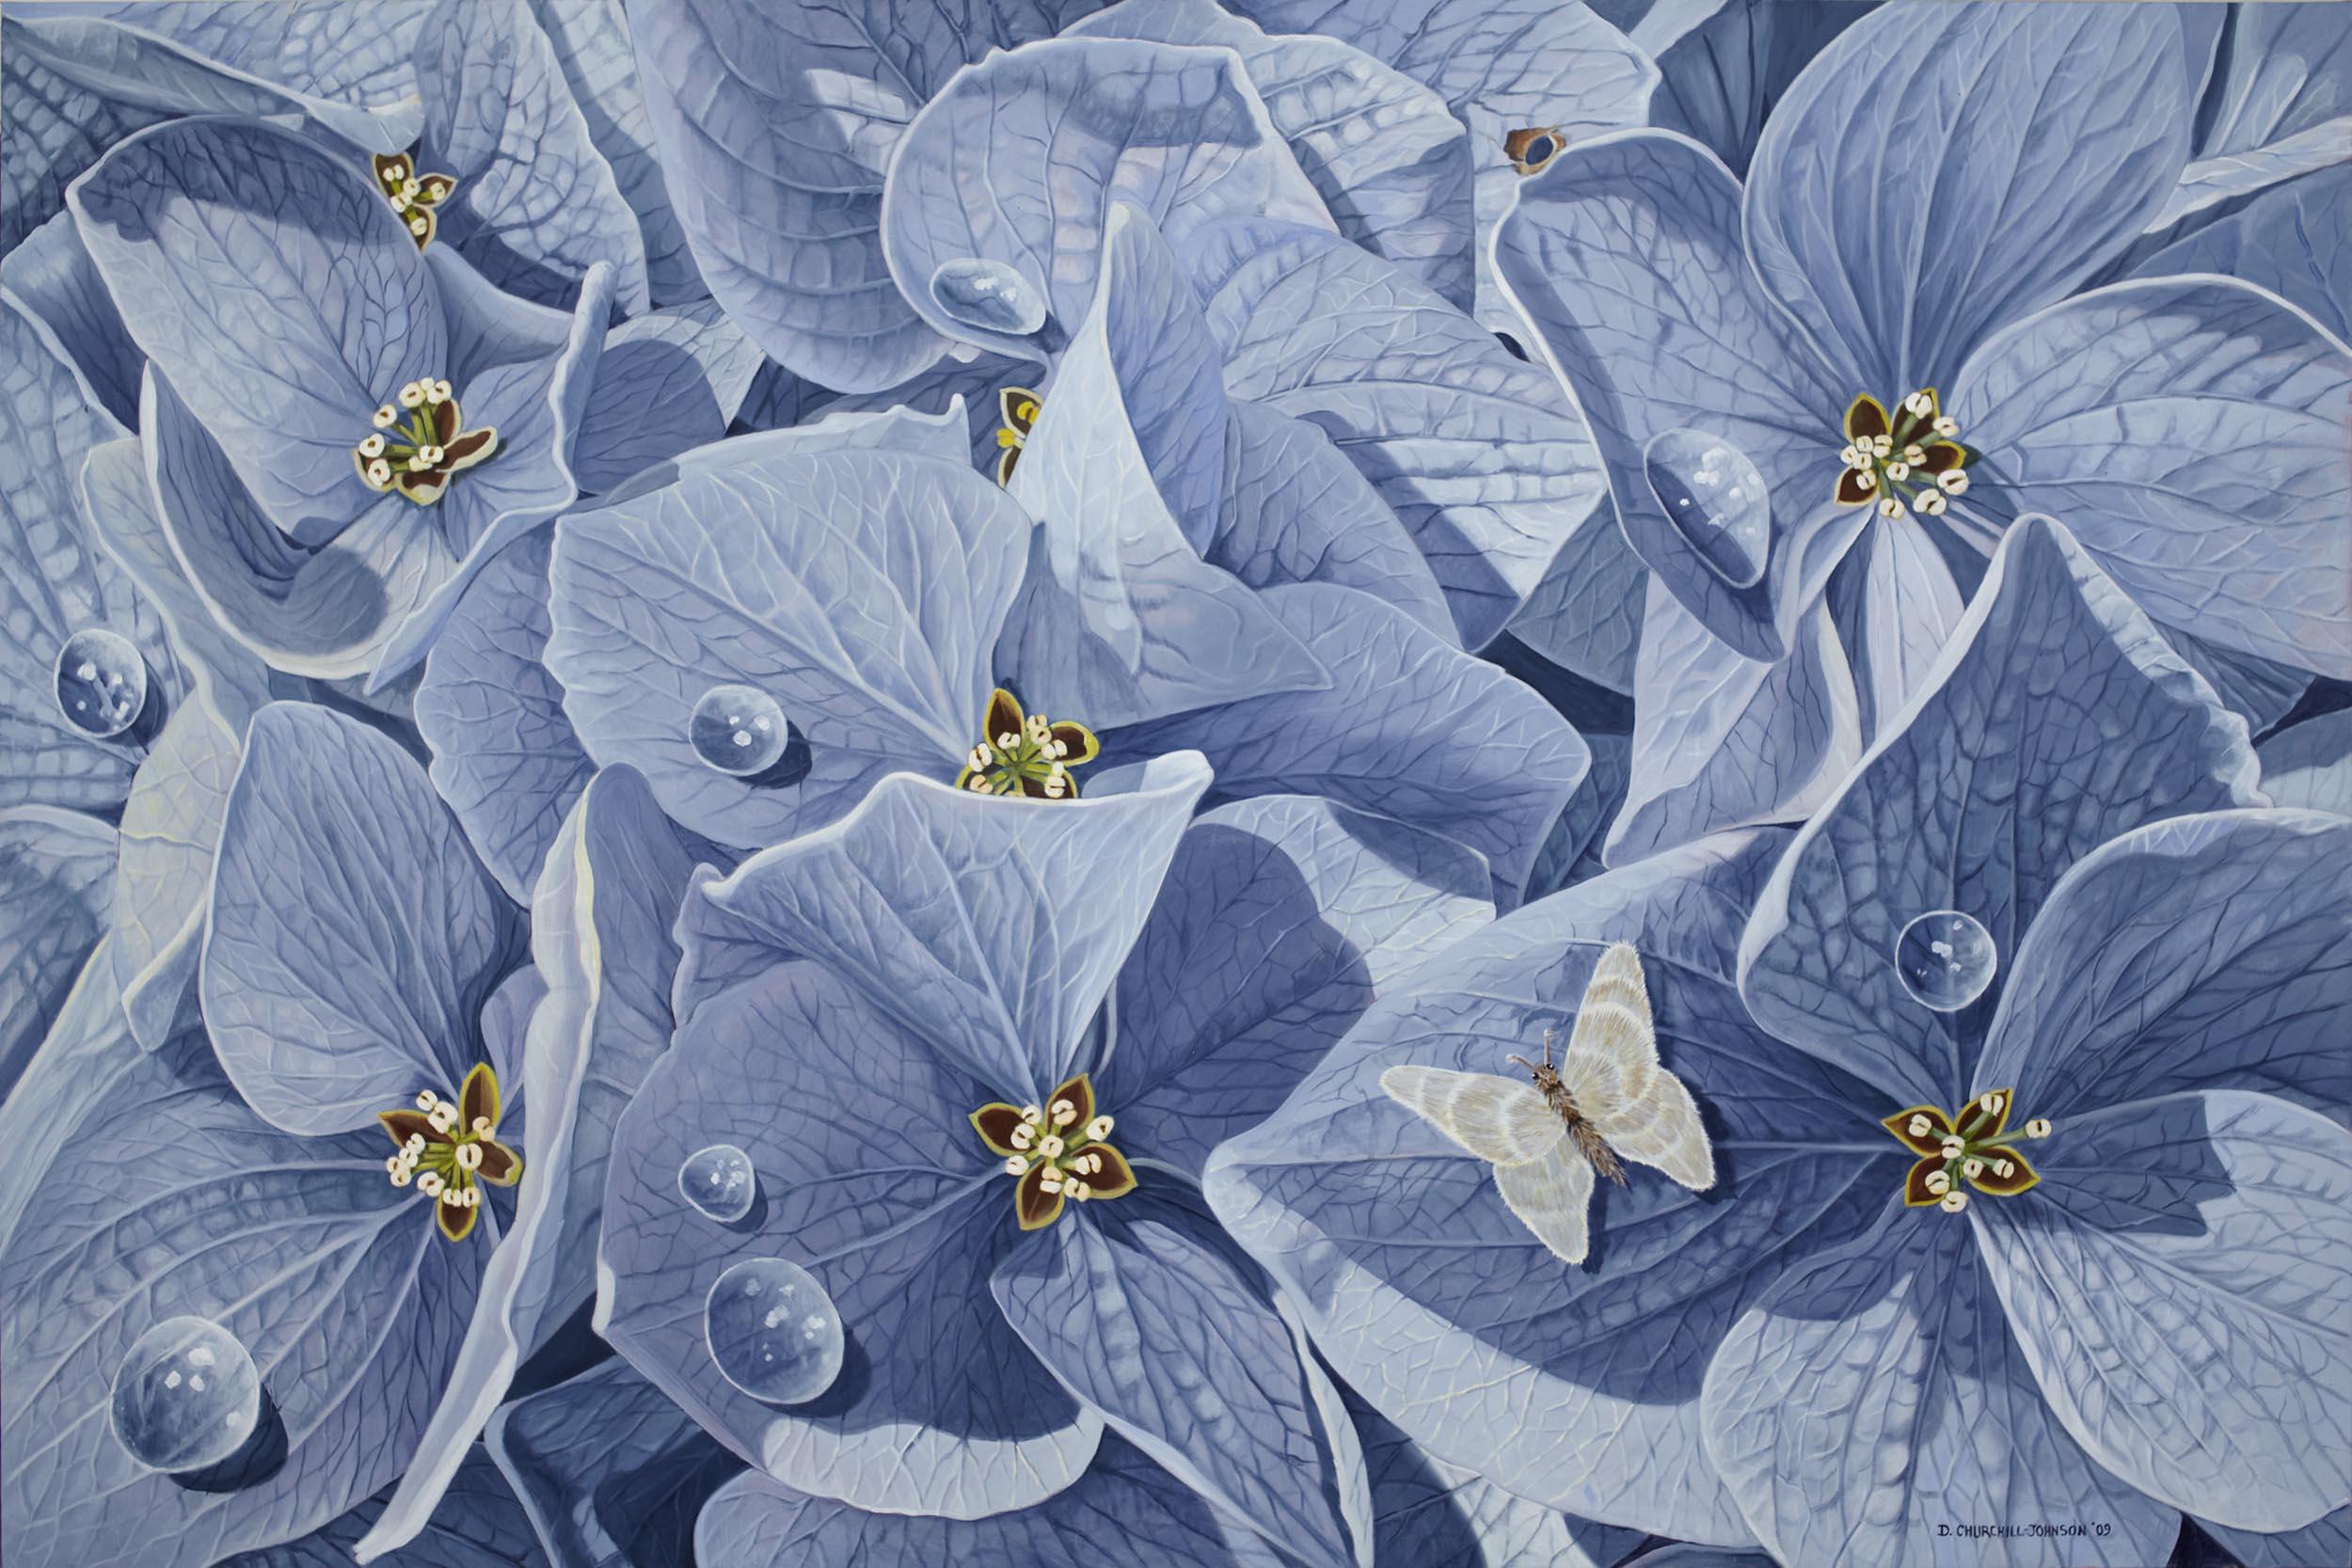 Inner Hydrangea, 48 x 72 inches